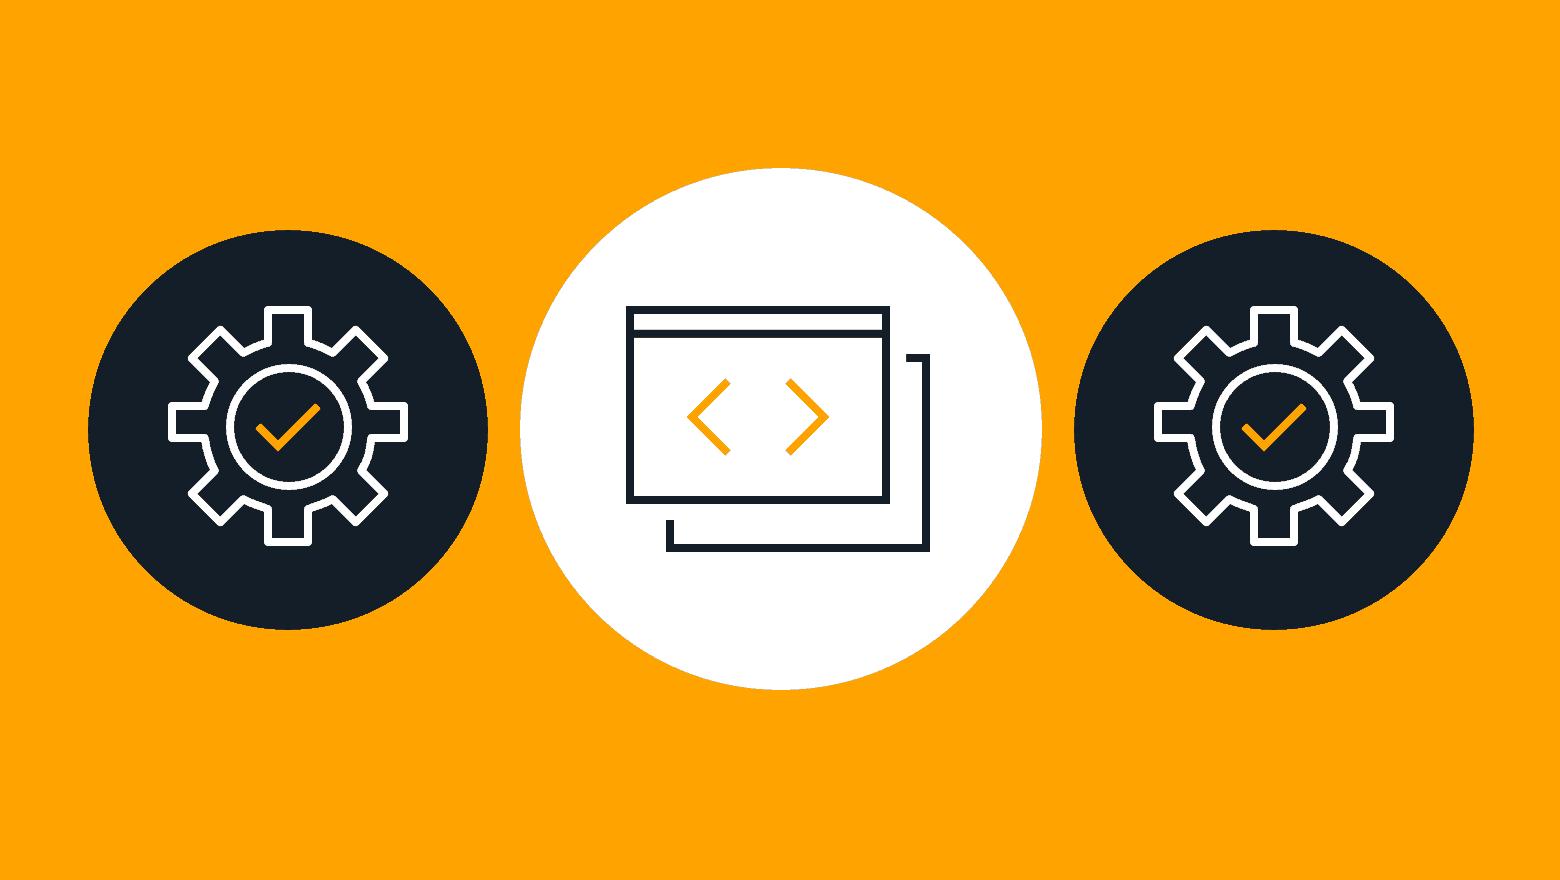 seo audit tool icon